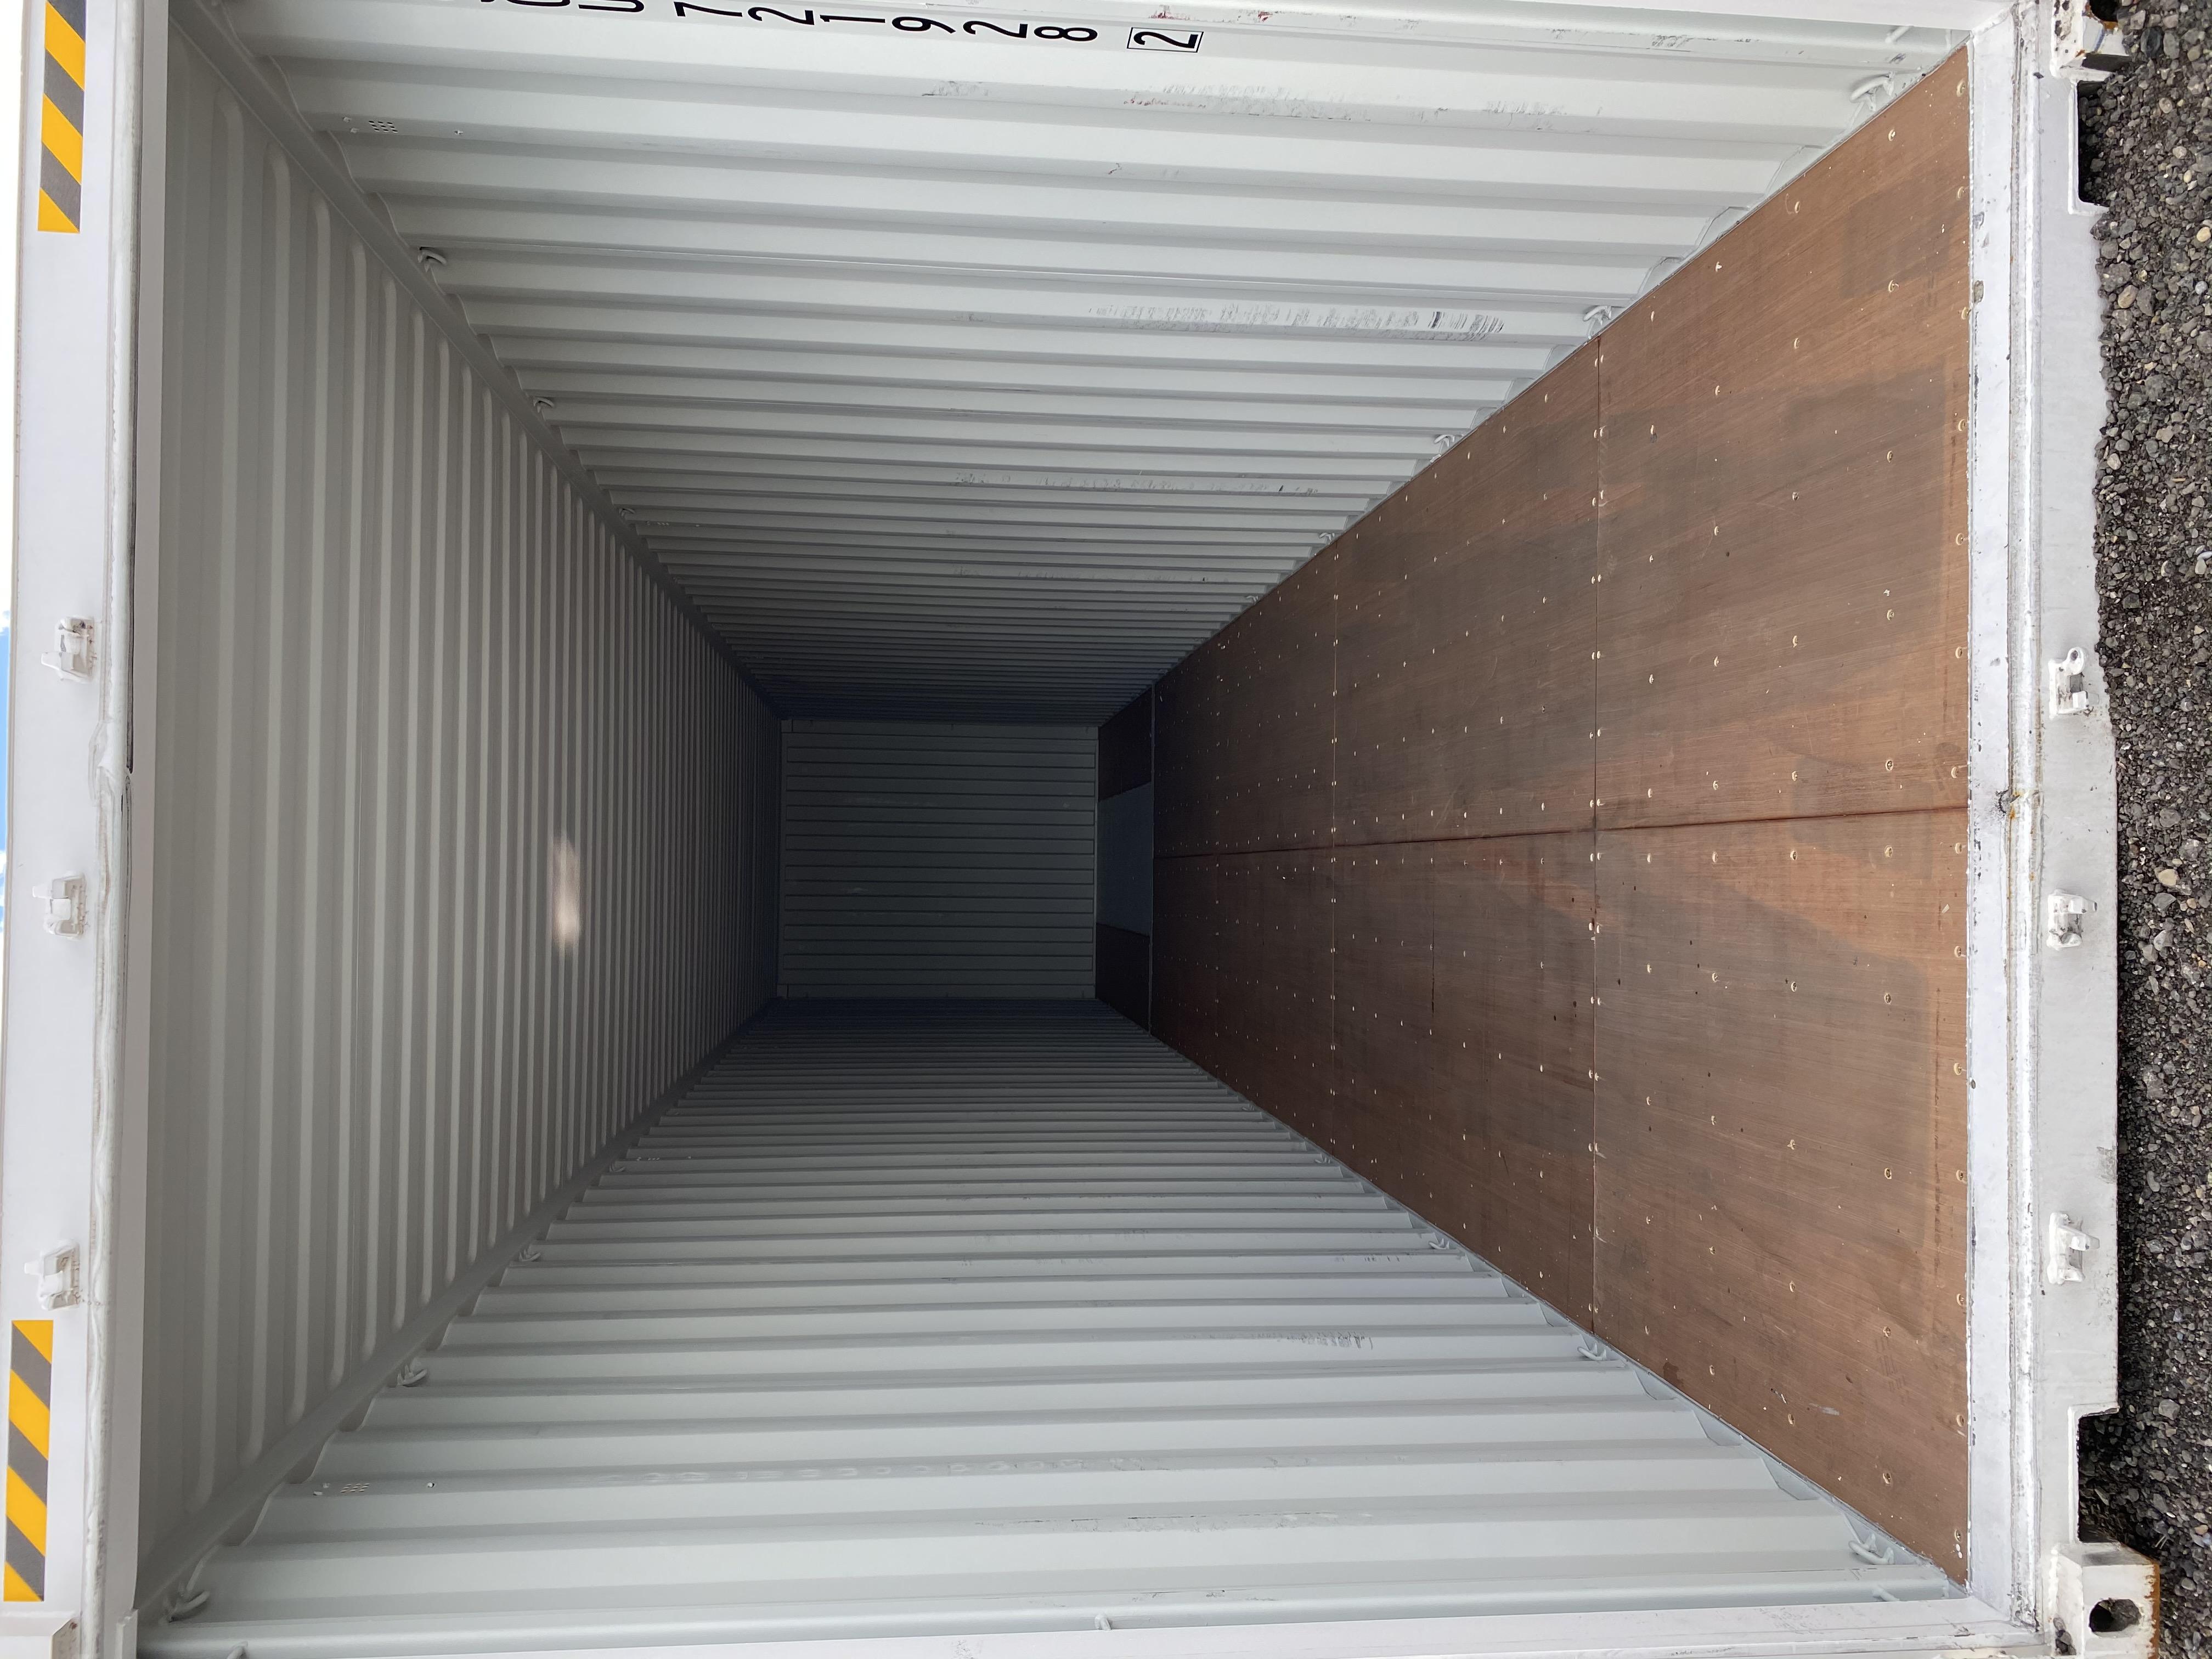 40x8 Storage Unit Calgary, AB